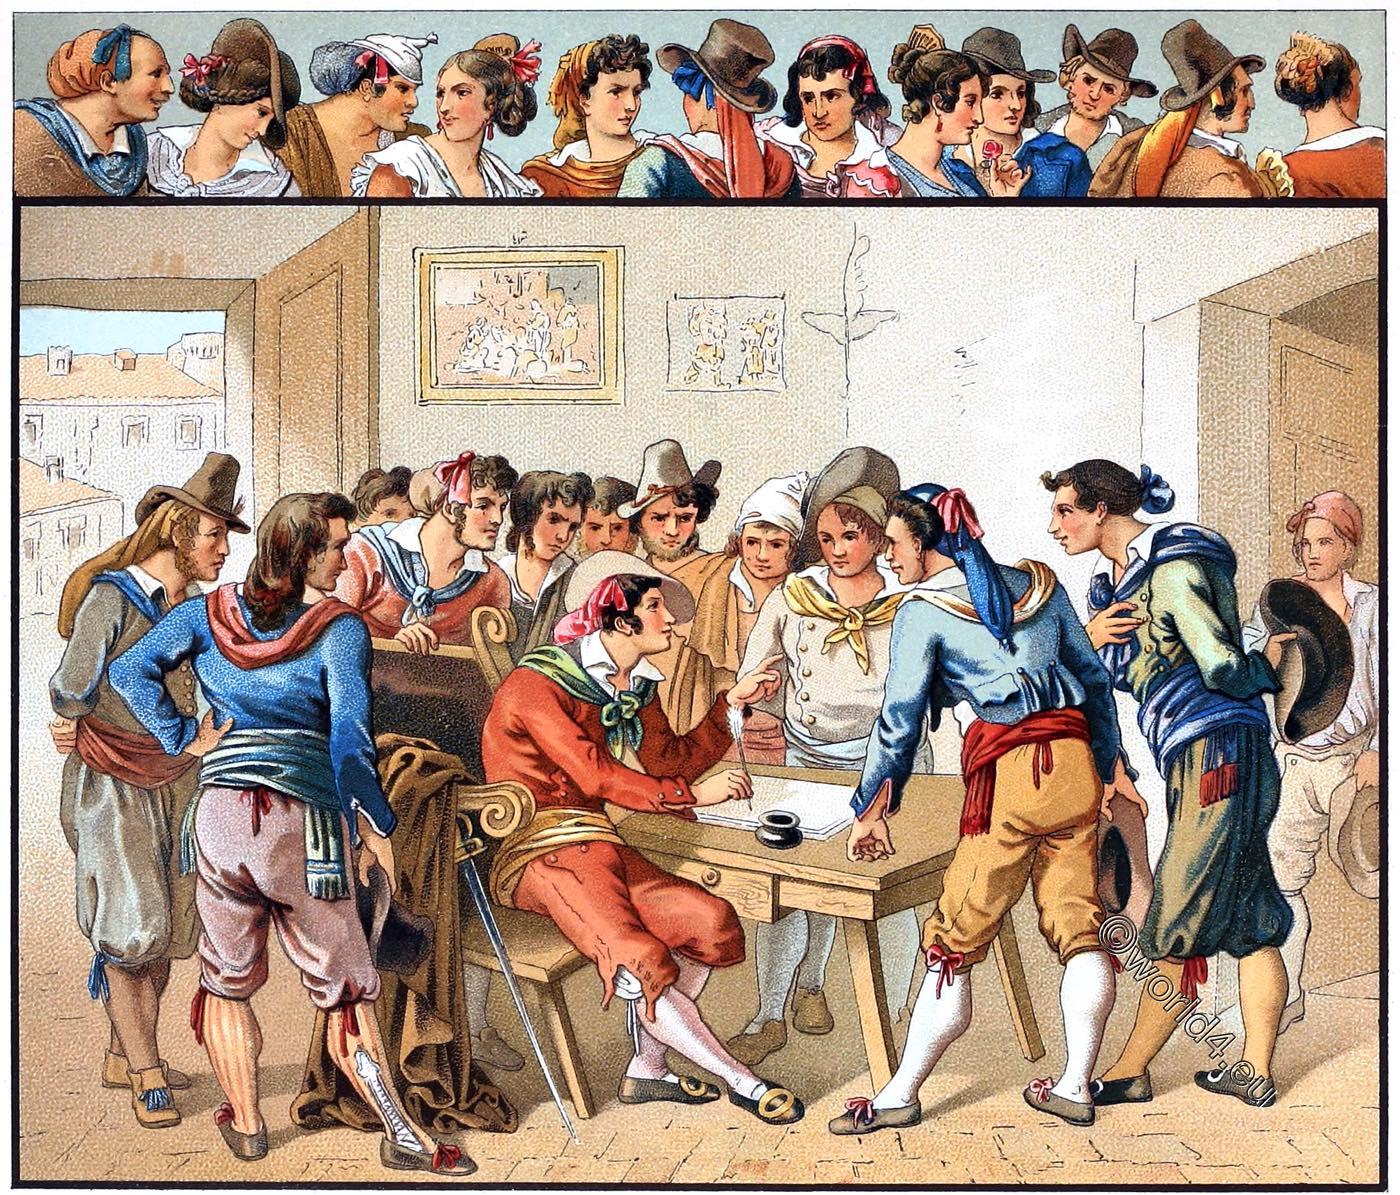 Trastevere, Italy, Roman, folk, costumes, Auguste Racinet